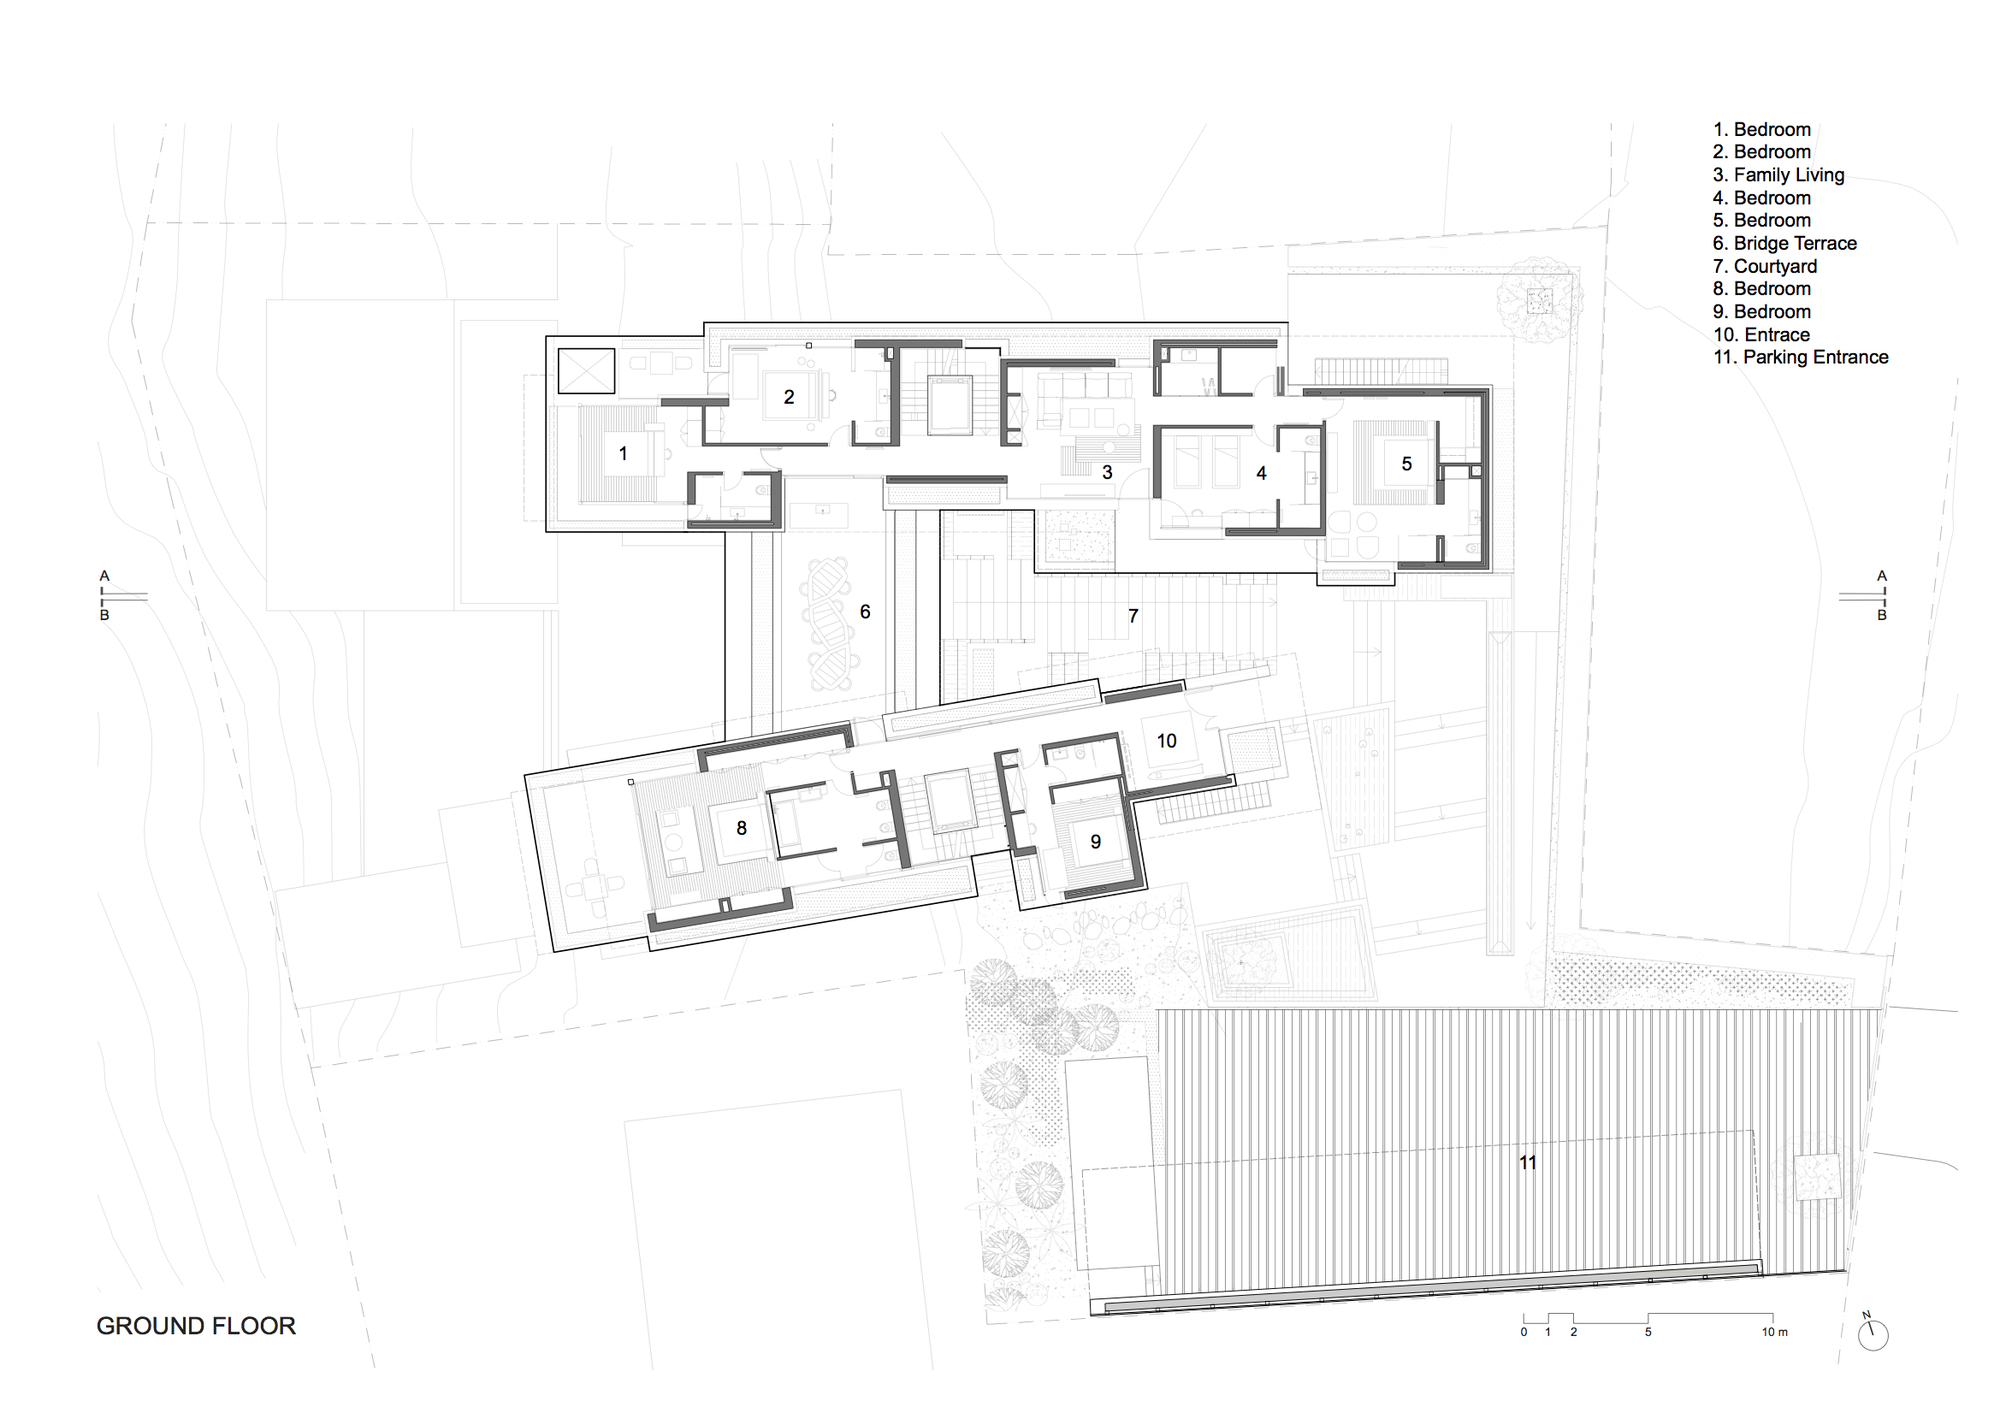 Blank Floor Plan Blank House Template Wattle Cottage Dining Room - Blank floor plan